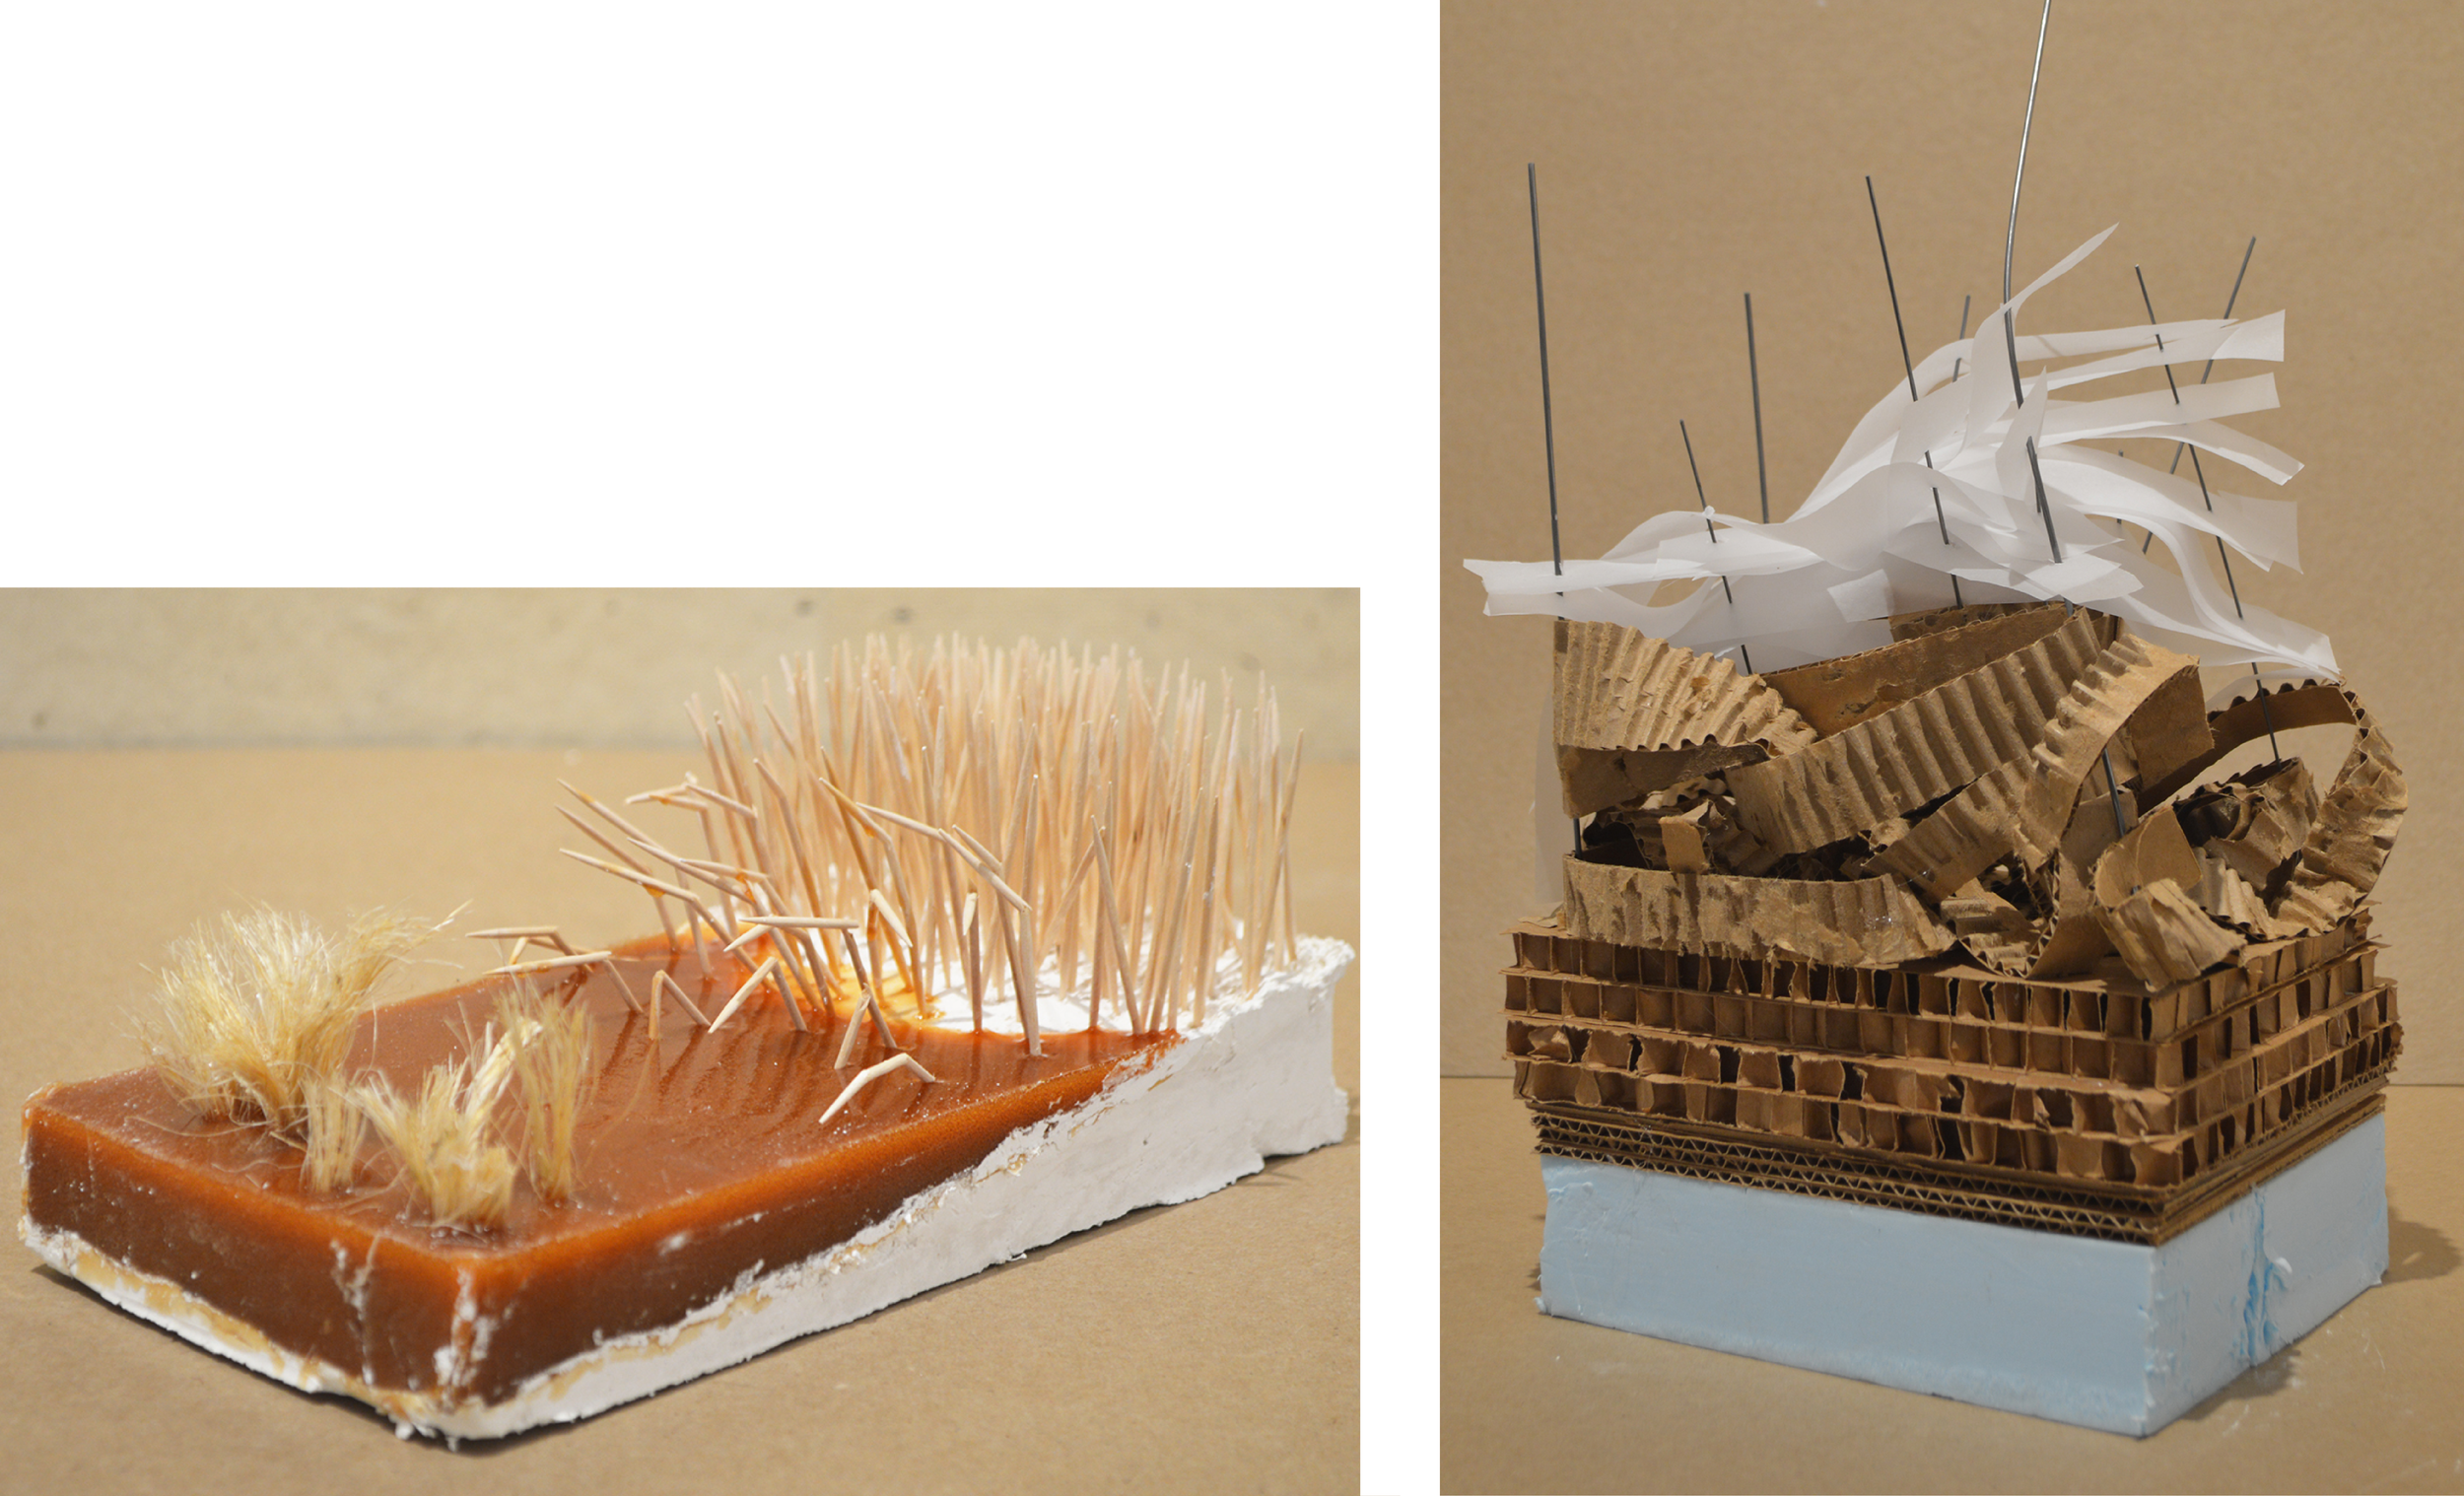 Above - Plaster, liquid casting rubber, hemp string, toothpicks. Right - Blue foam, recycled honey-comb cardboard, steel rod, vellum.